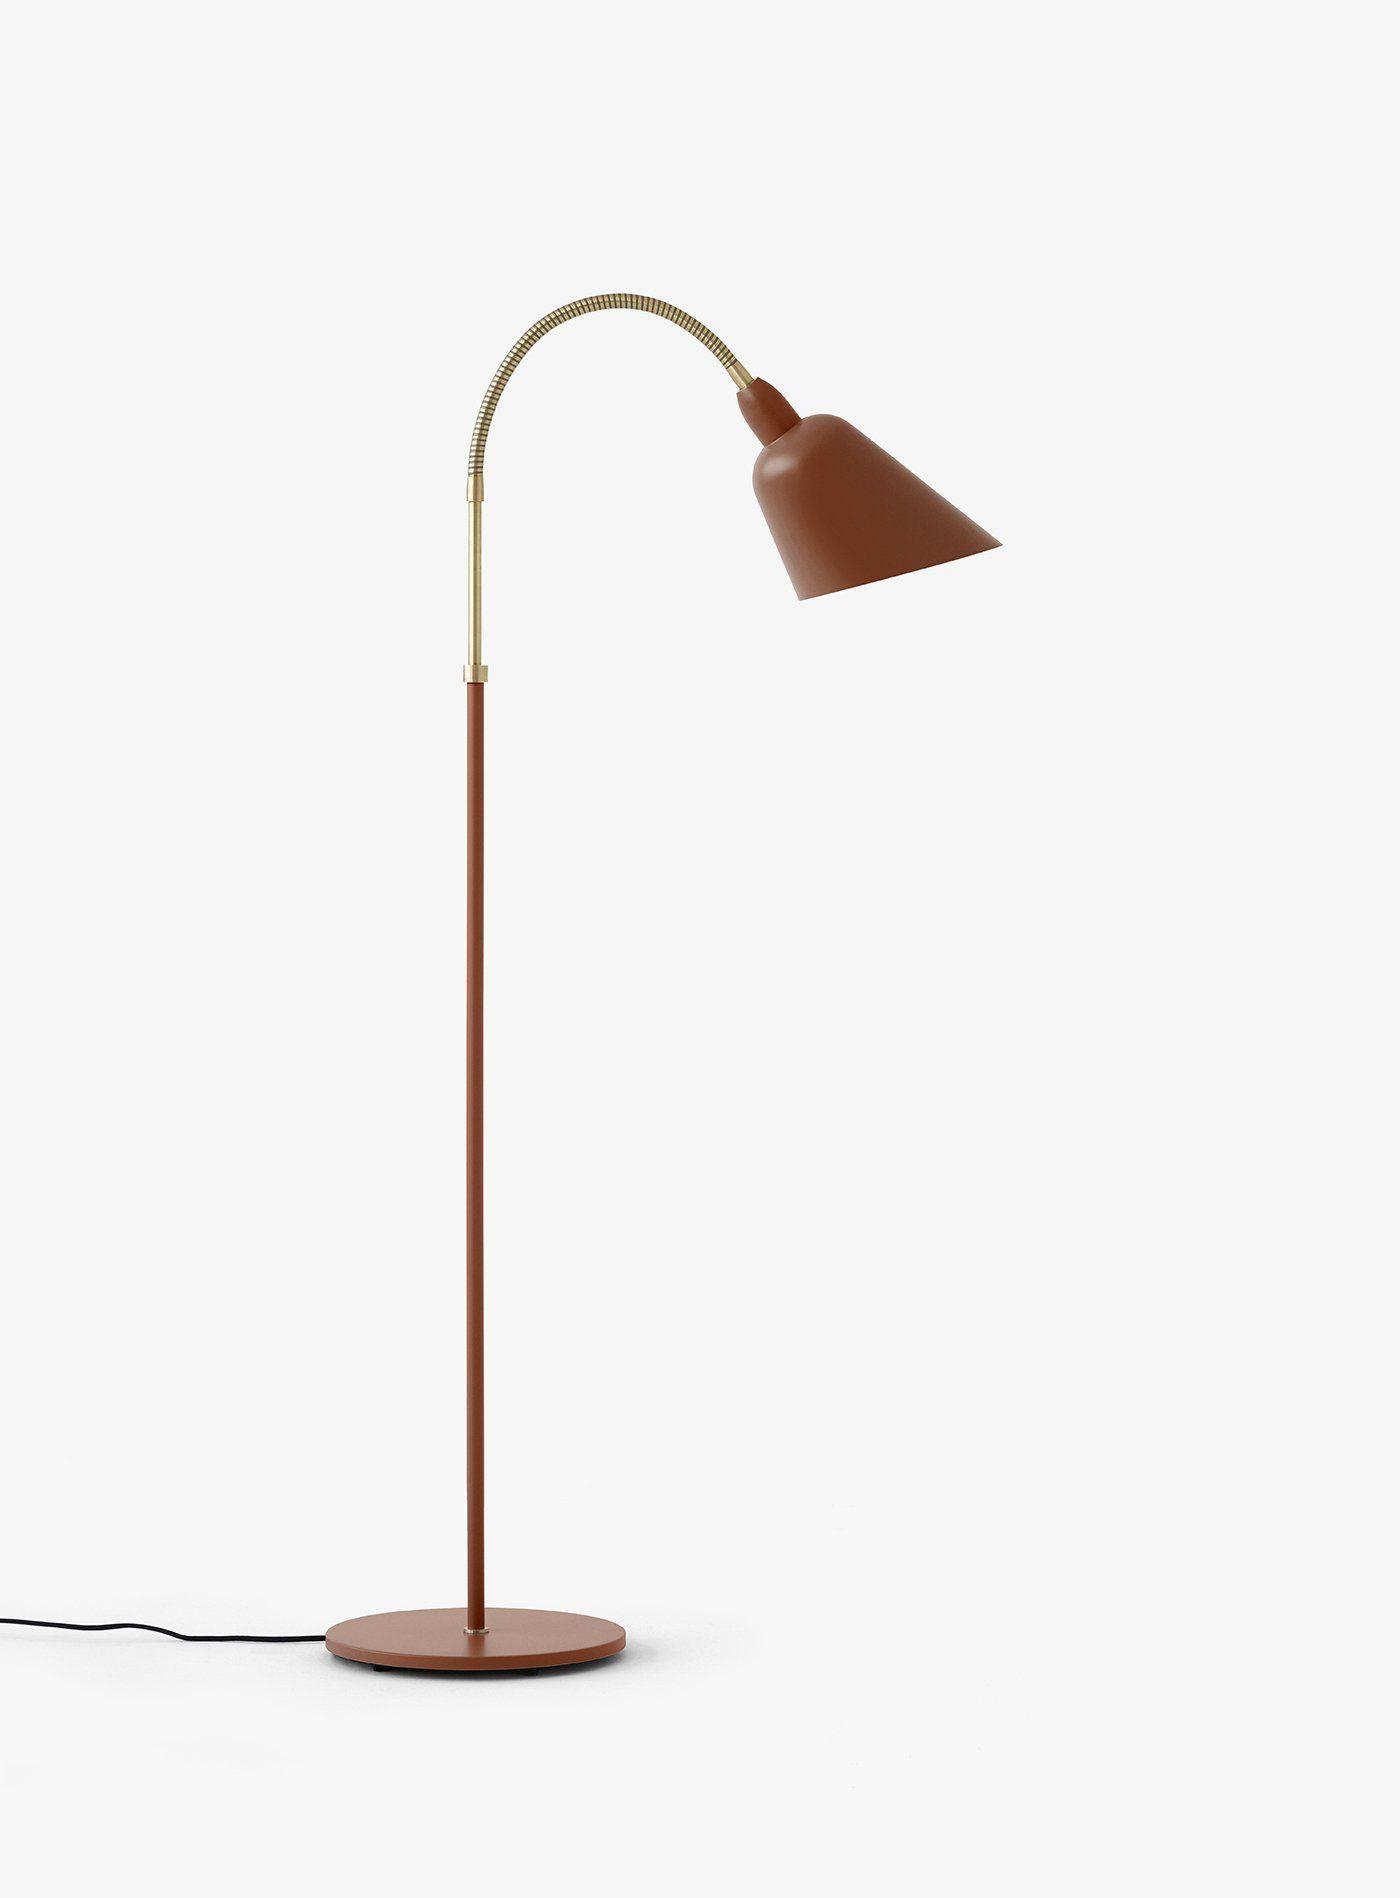 Tradition Lamp Floor Lamp Desk Lamp